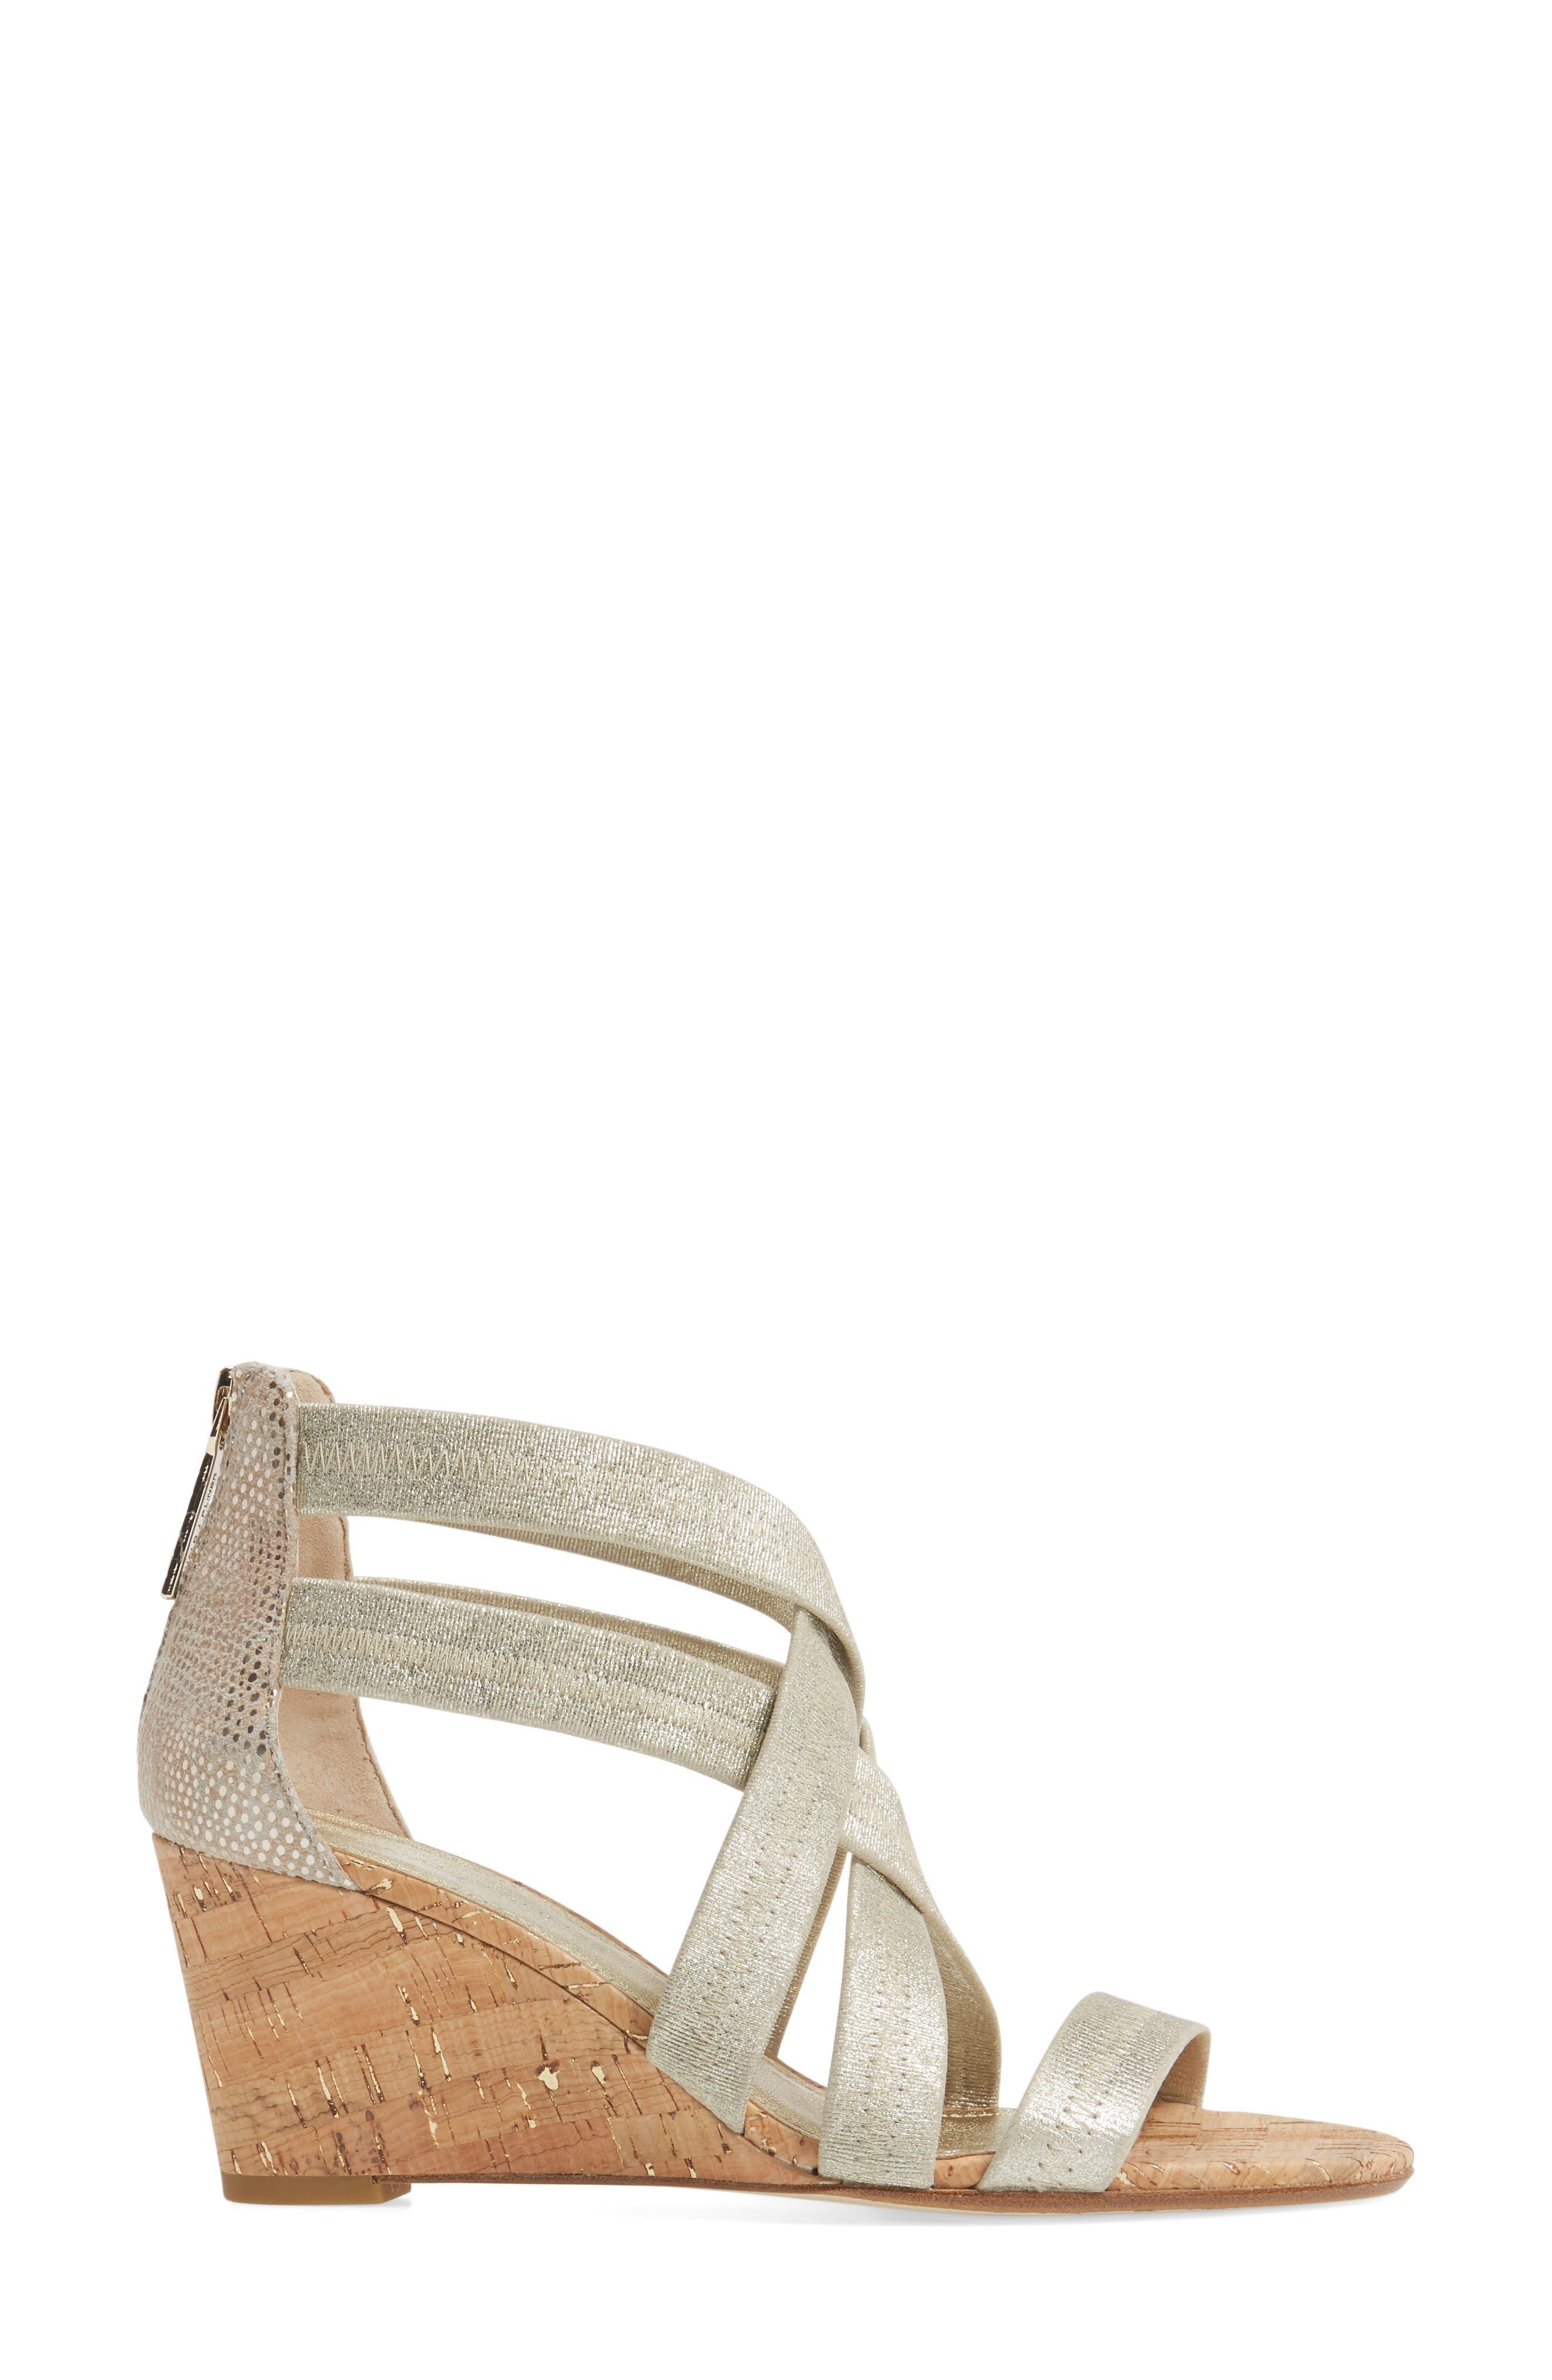 Donald J Pliner Jemi Wedge Sandal,                             Alternate thumbnail 3, color,                             Platino Leather